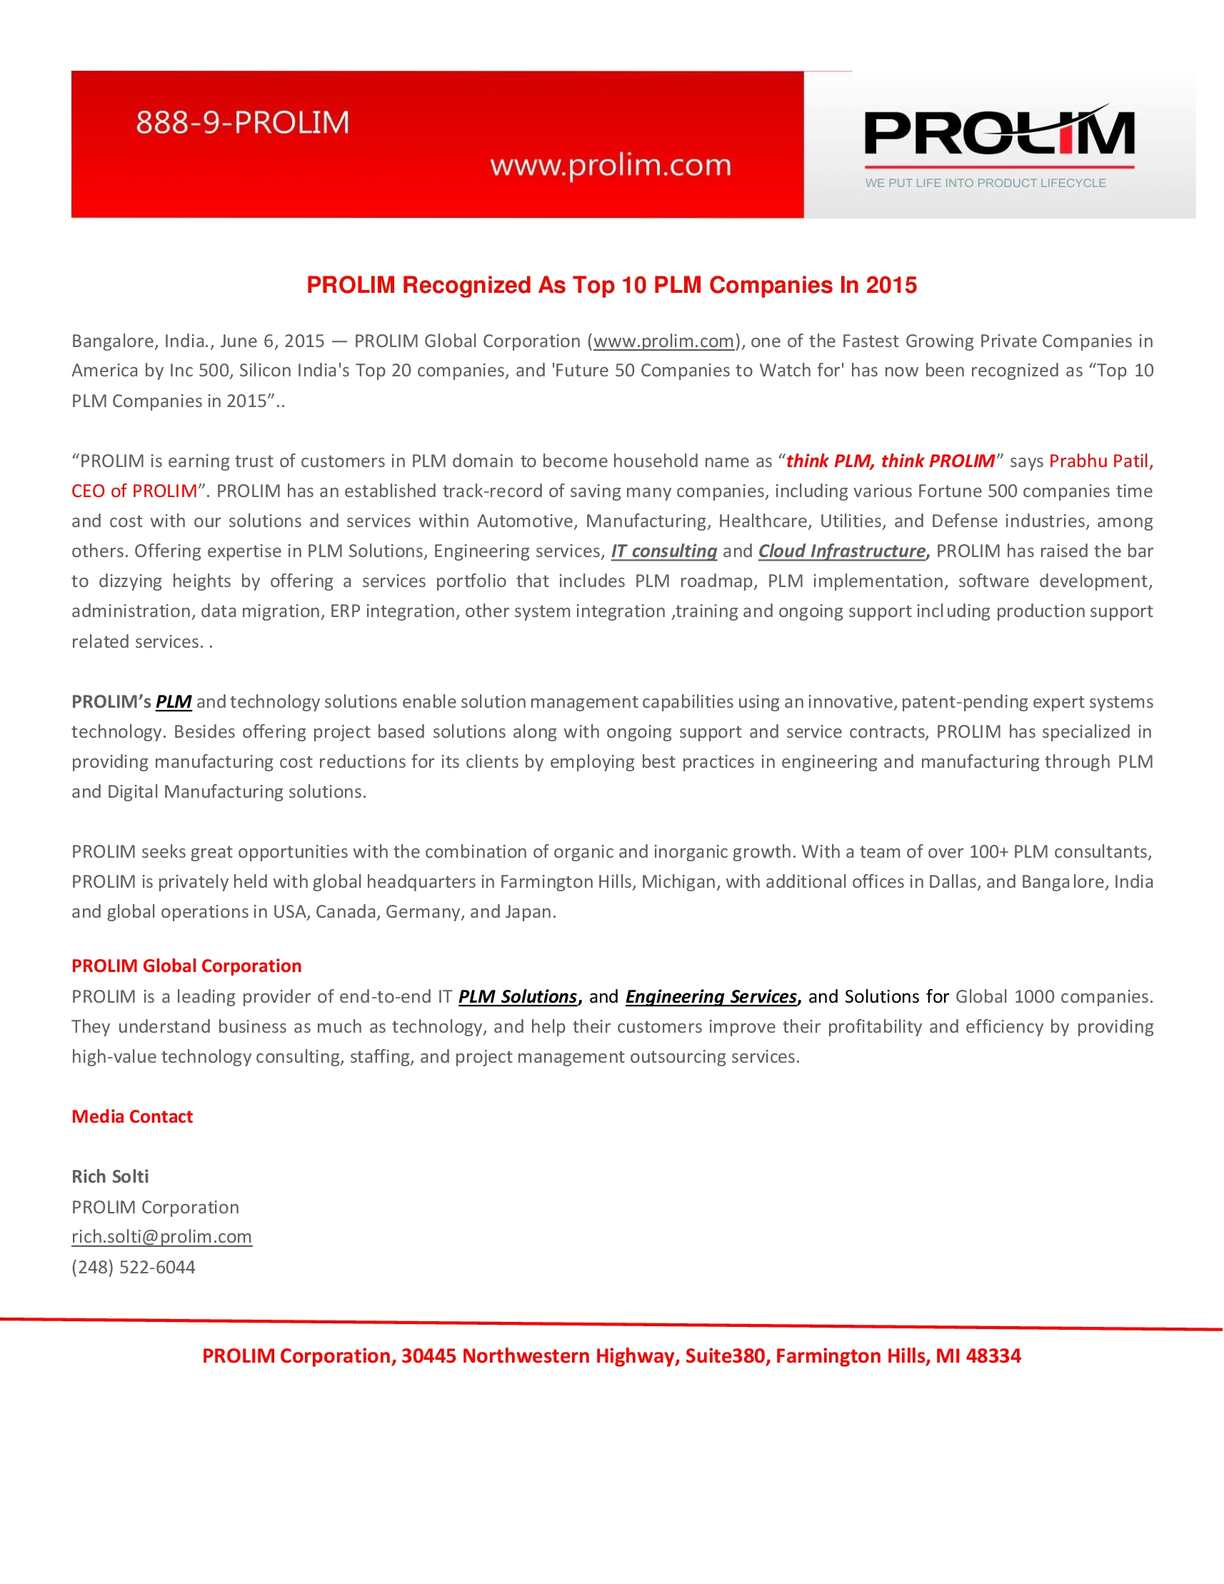 Calaméo - PROLIM Recognized As Top 10 PLM Companies In 2015